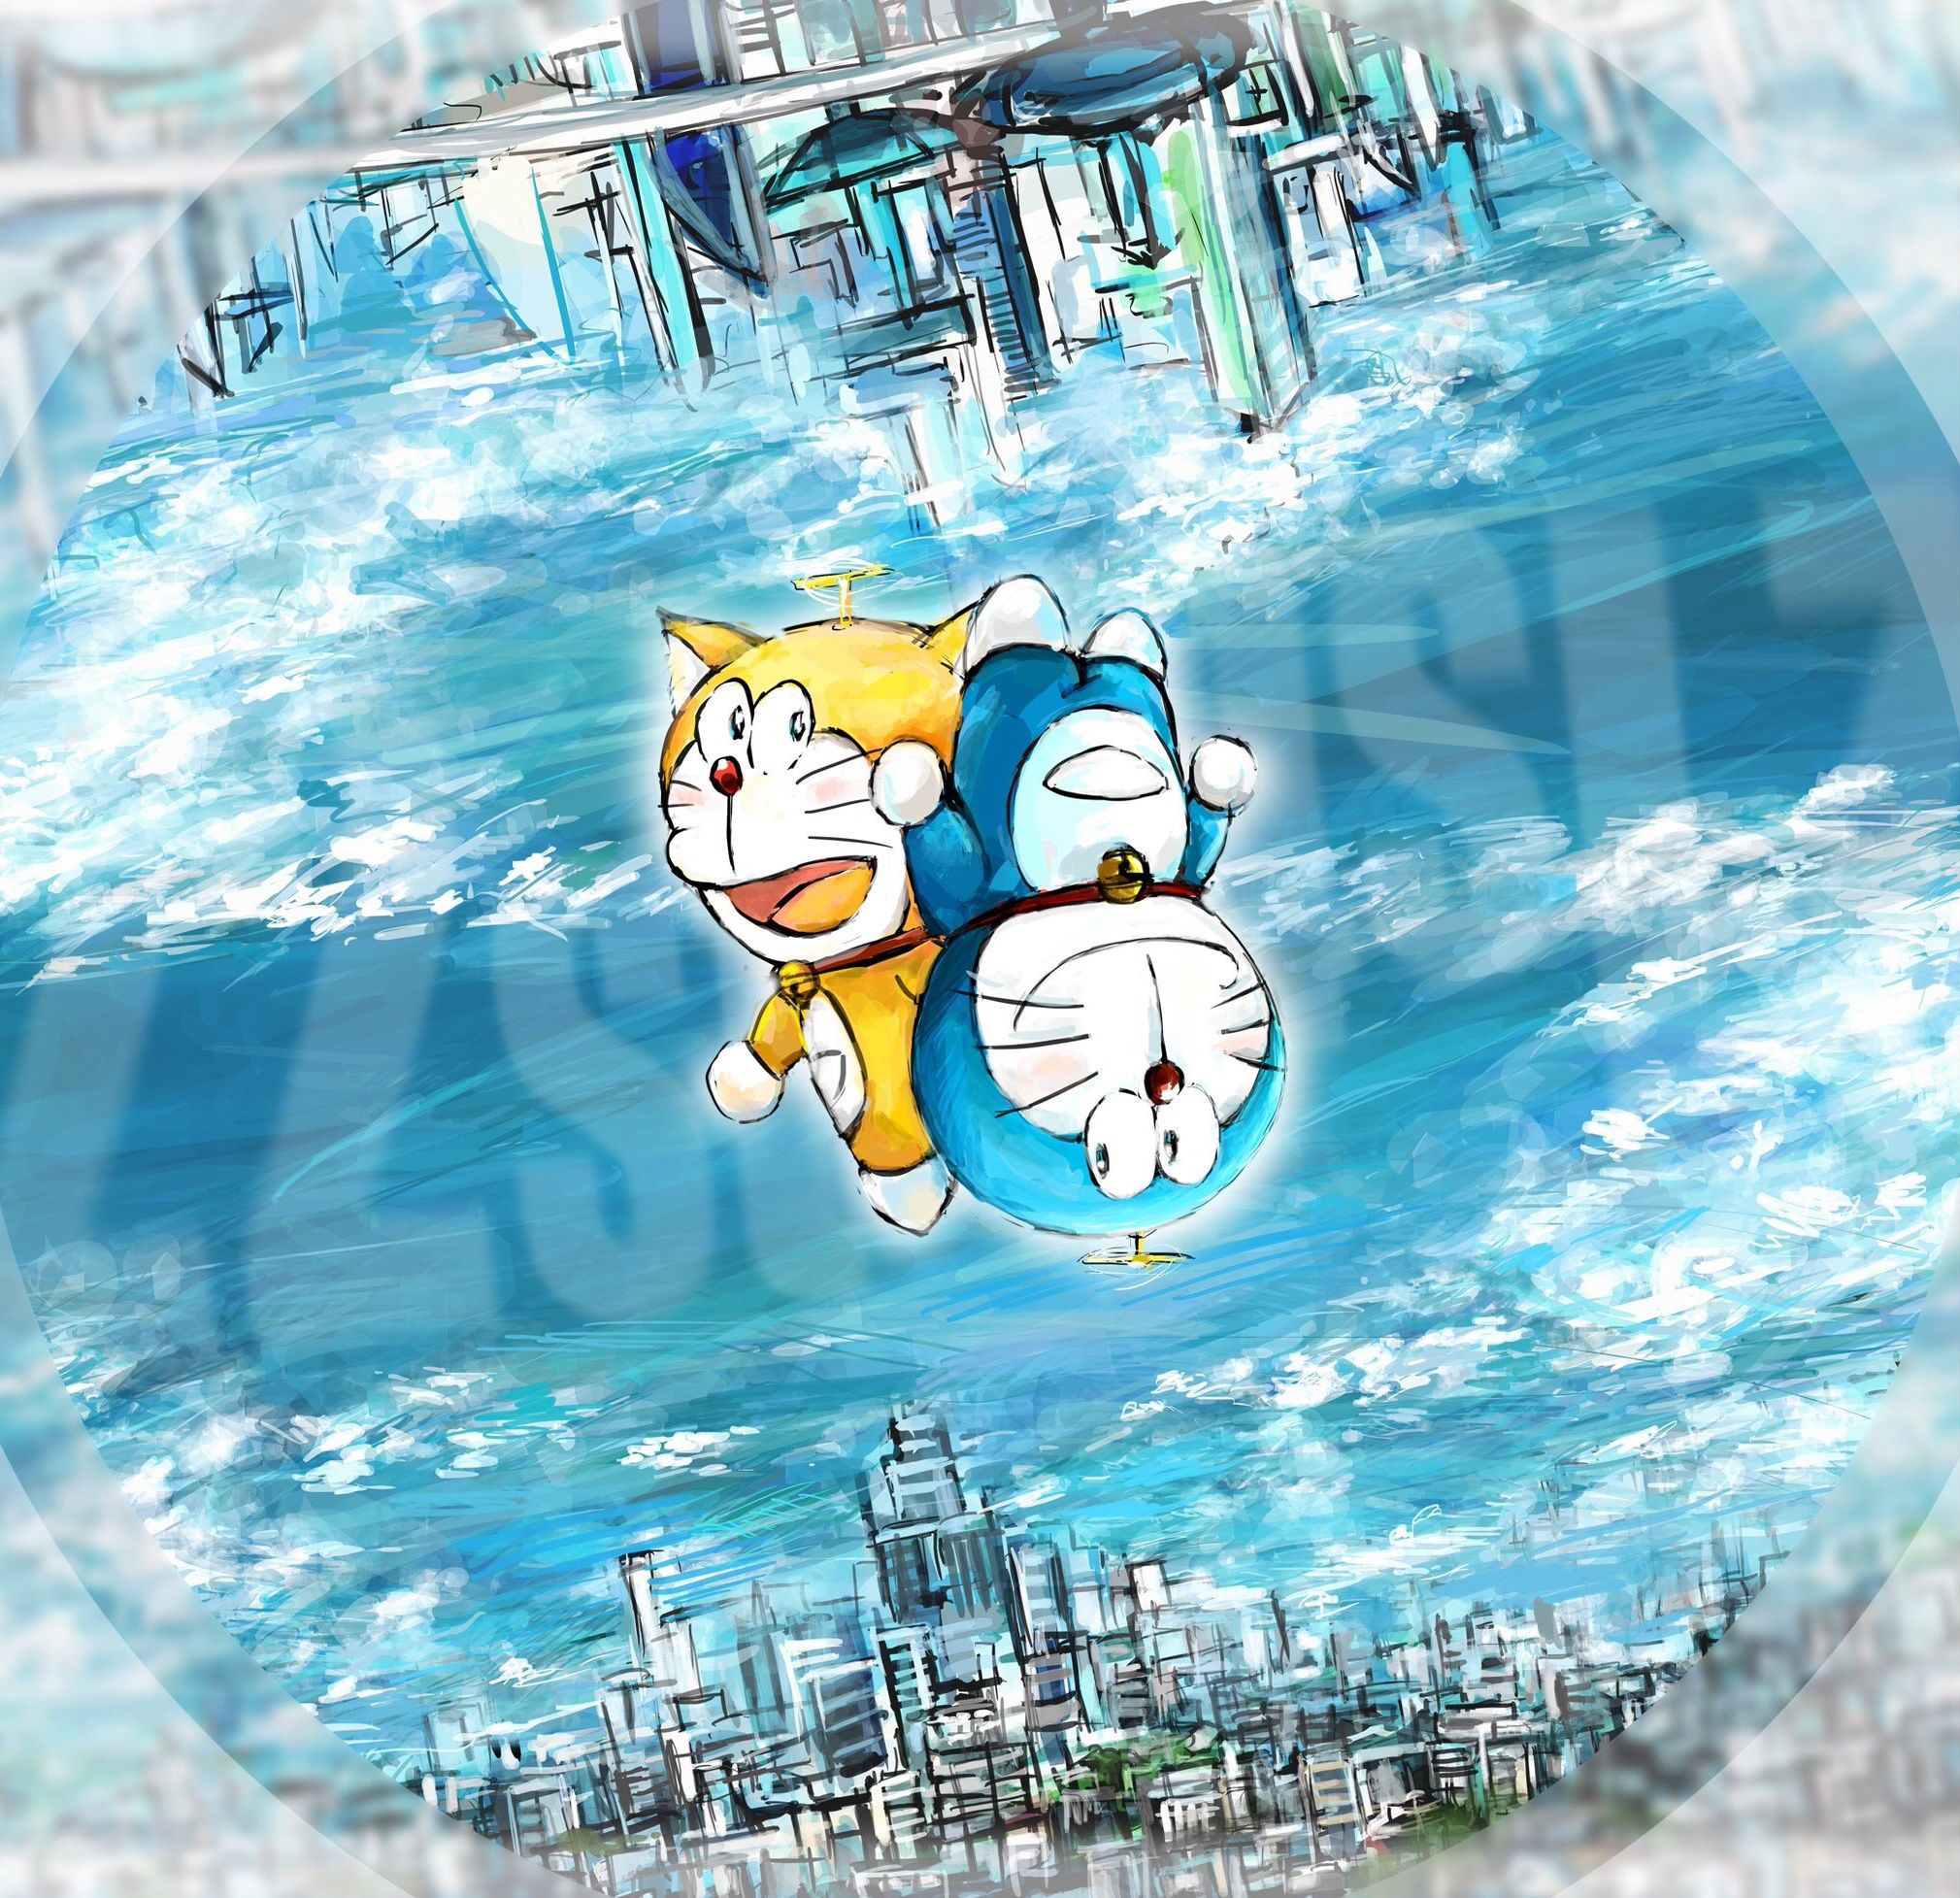 ghim của perico graciela tren doraemon phim hoạt hinh doraemon anime